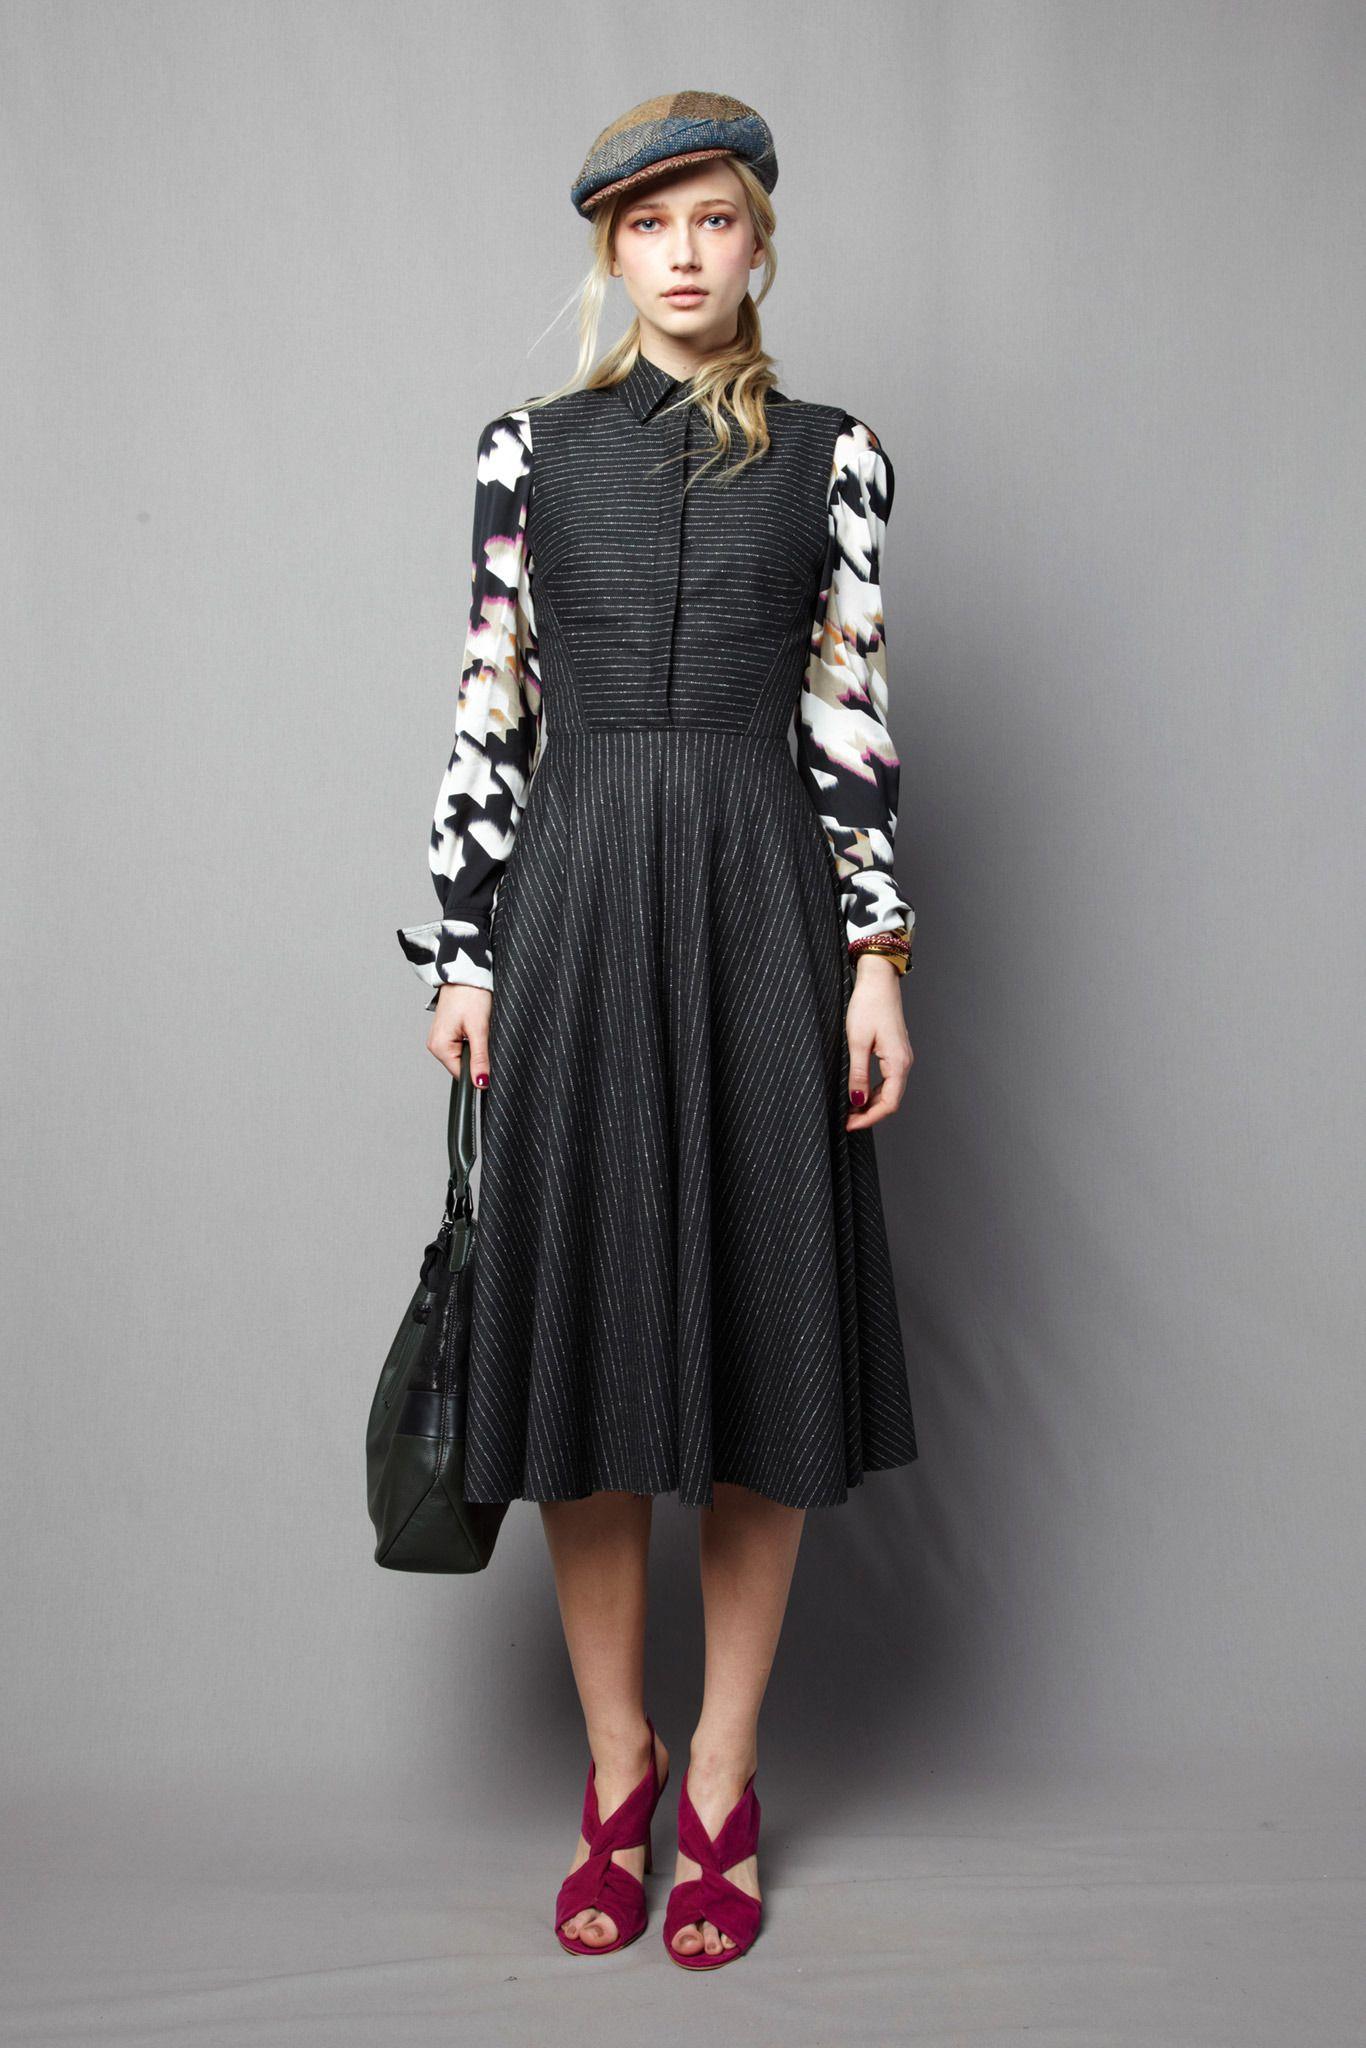 Trina Turk - Fall 2014 Ready-to-Wear - Look 12 of 33